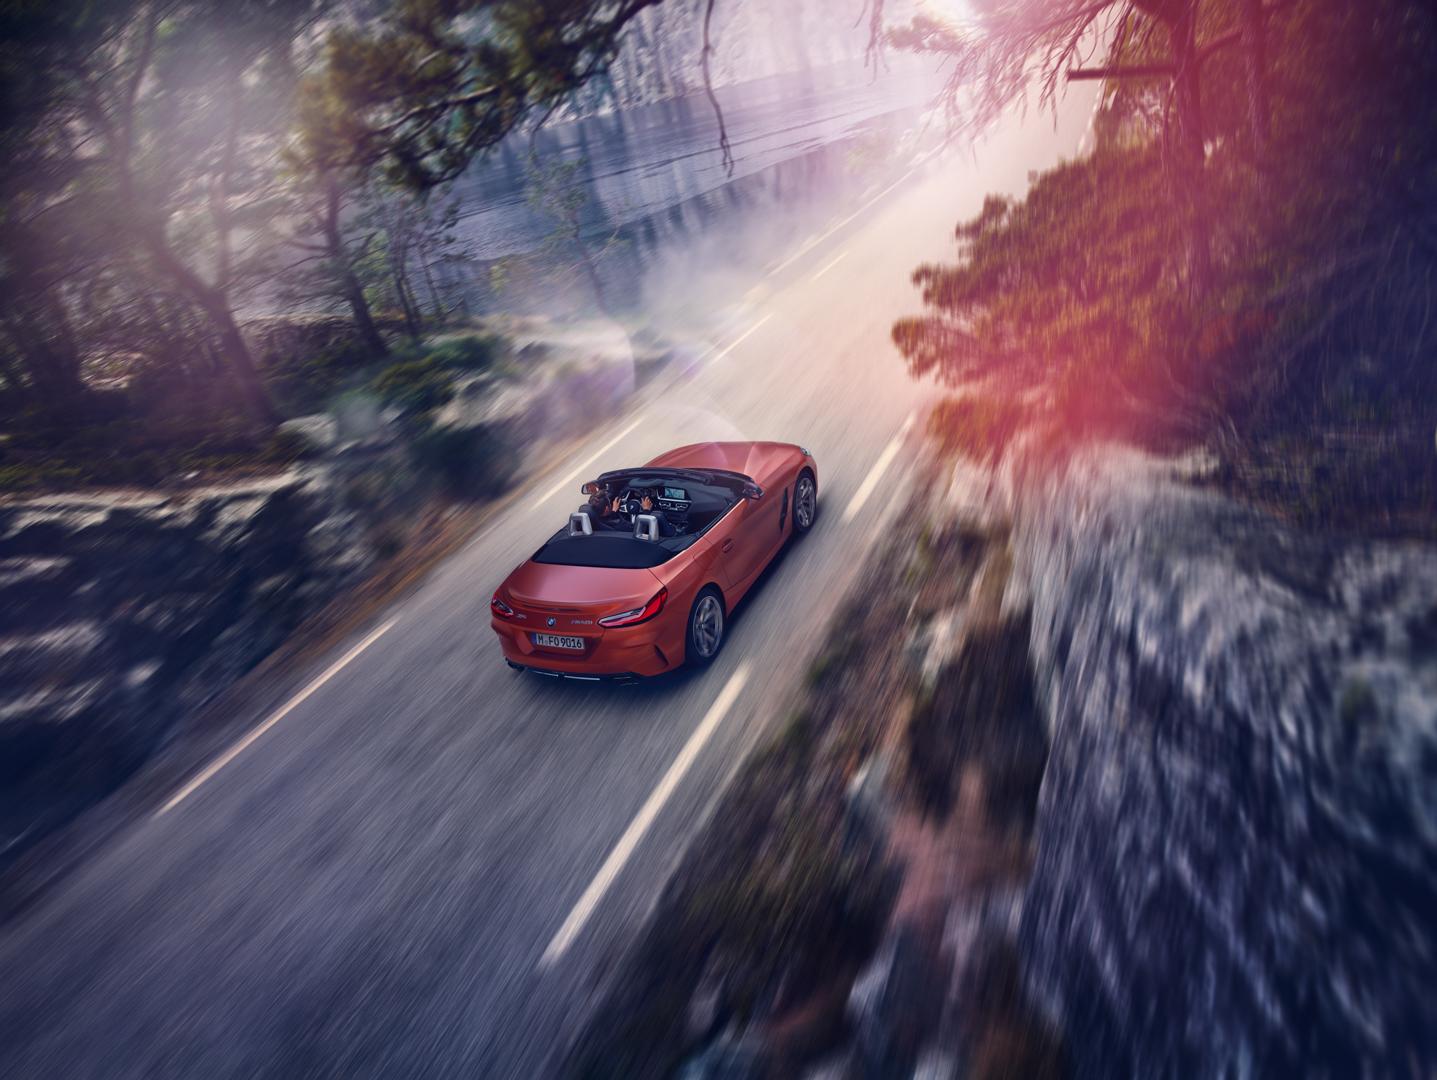 BMW Z4 leaked 5 of 7